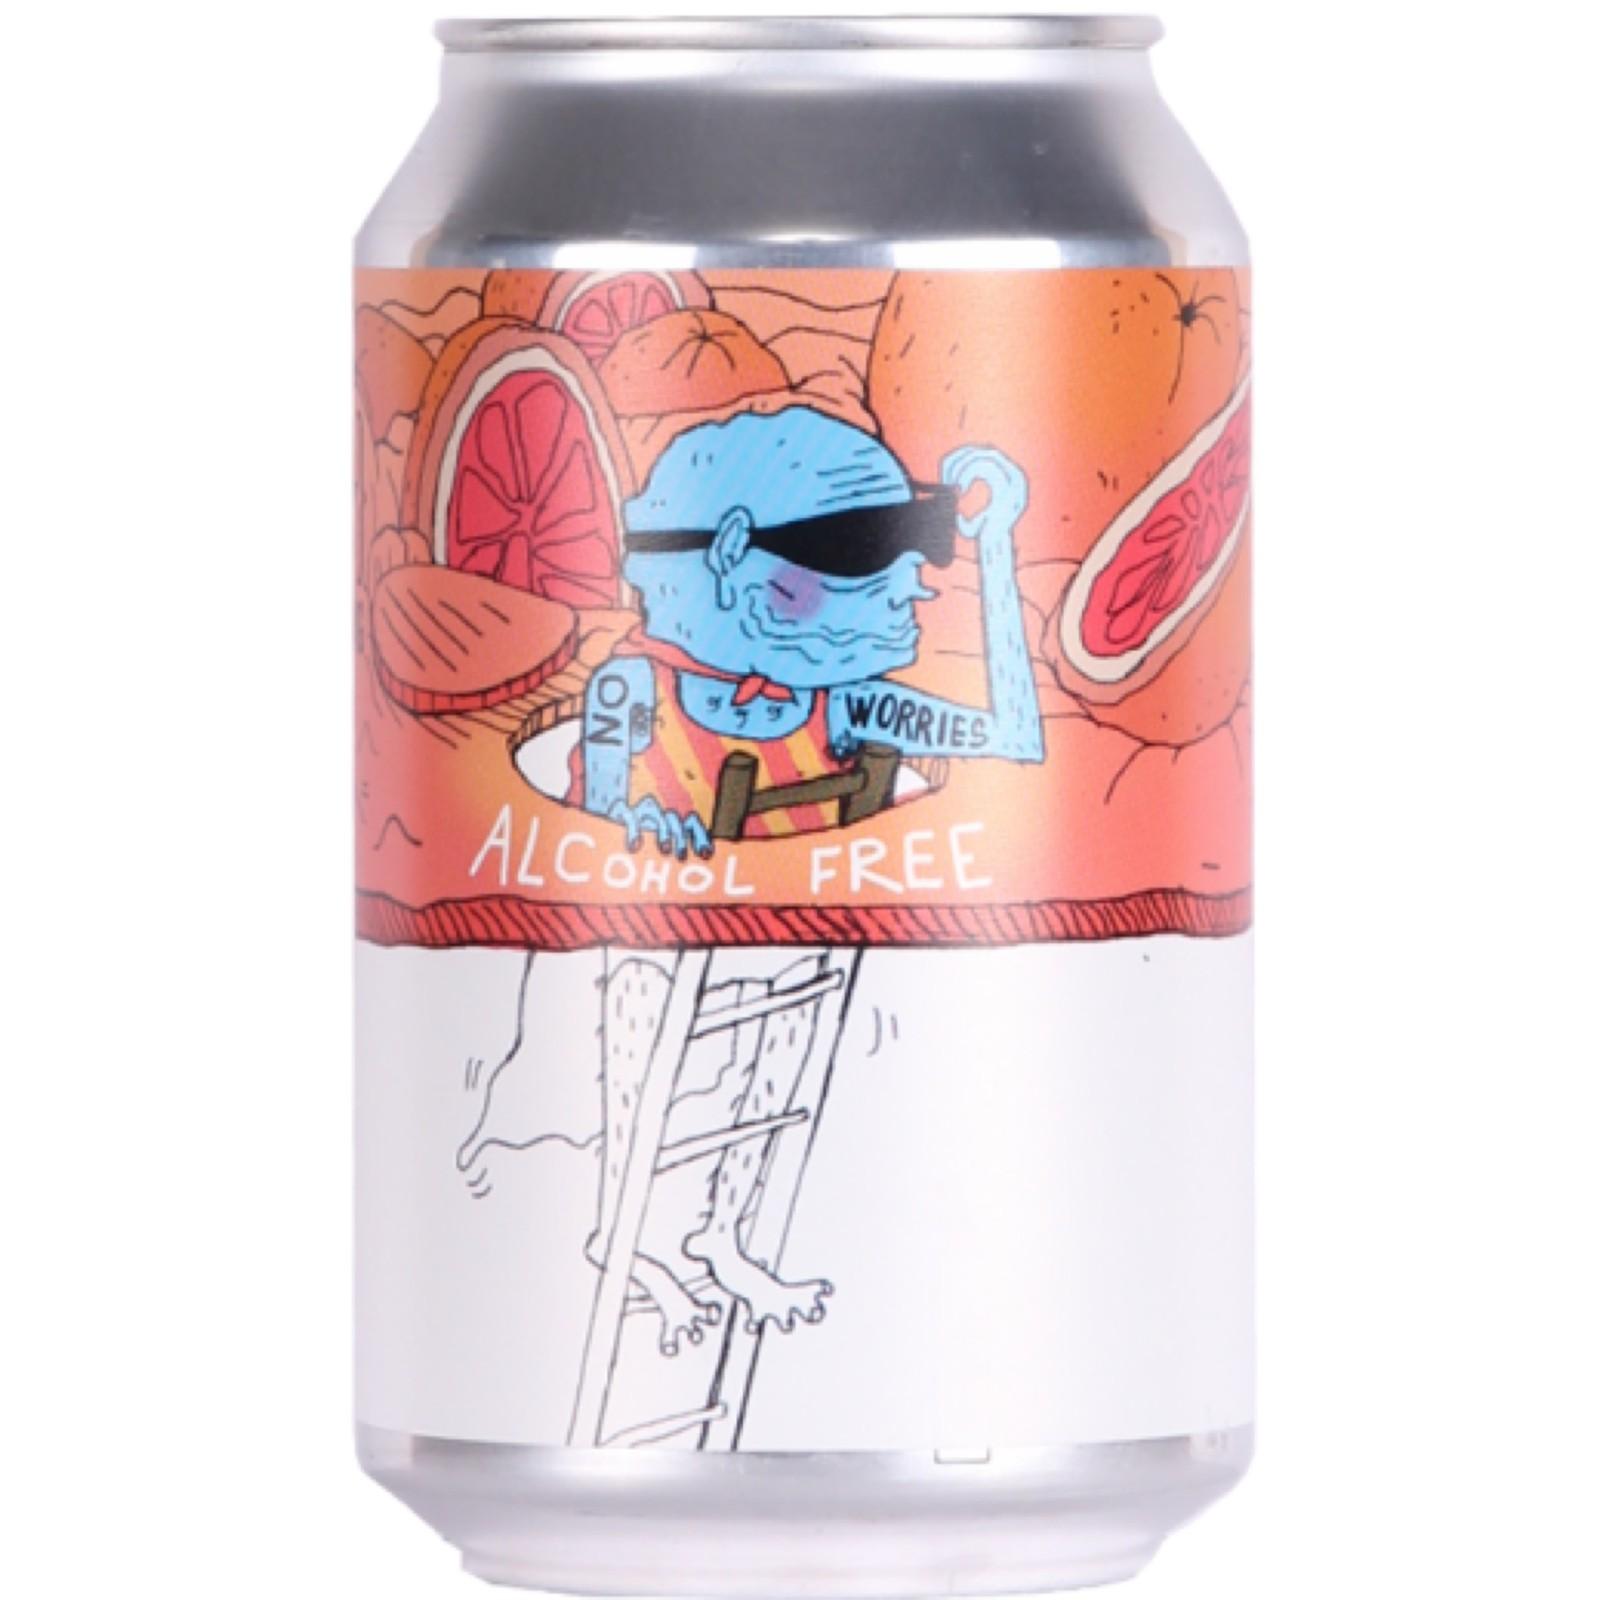 No Worries Grapefruit Alcohol Free IPA 0.5% 330ml Lervig Brewing